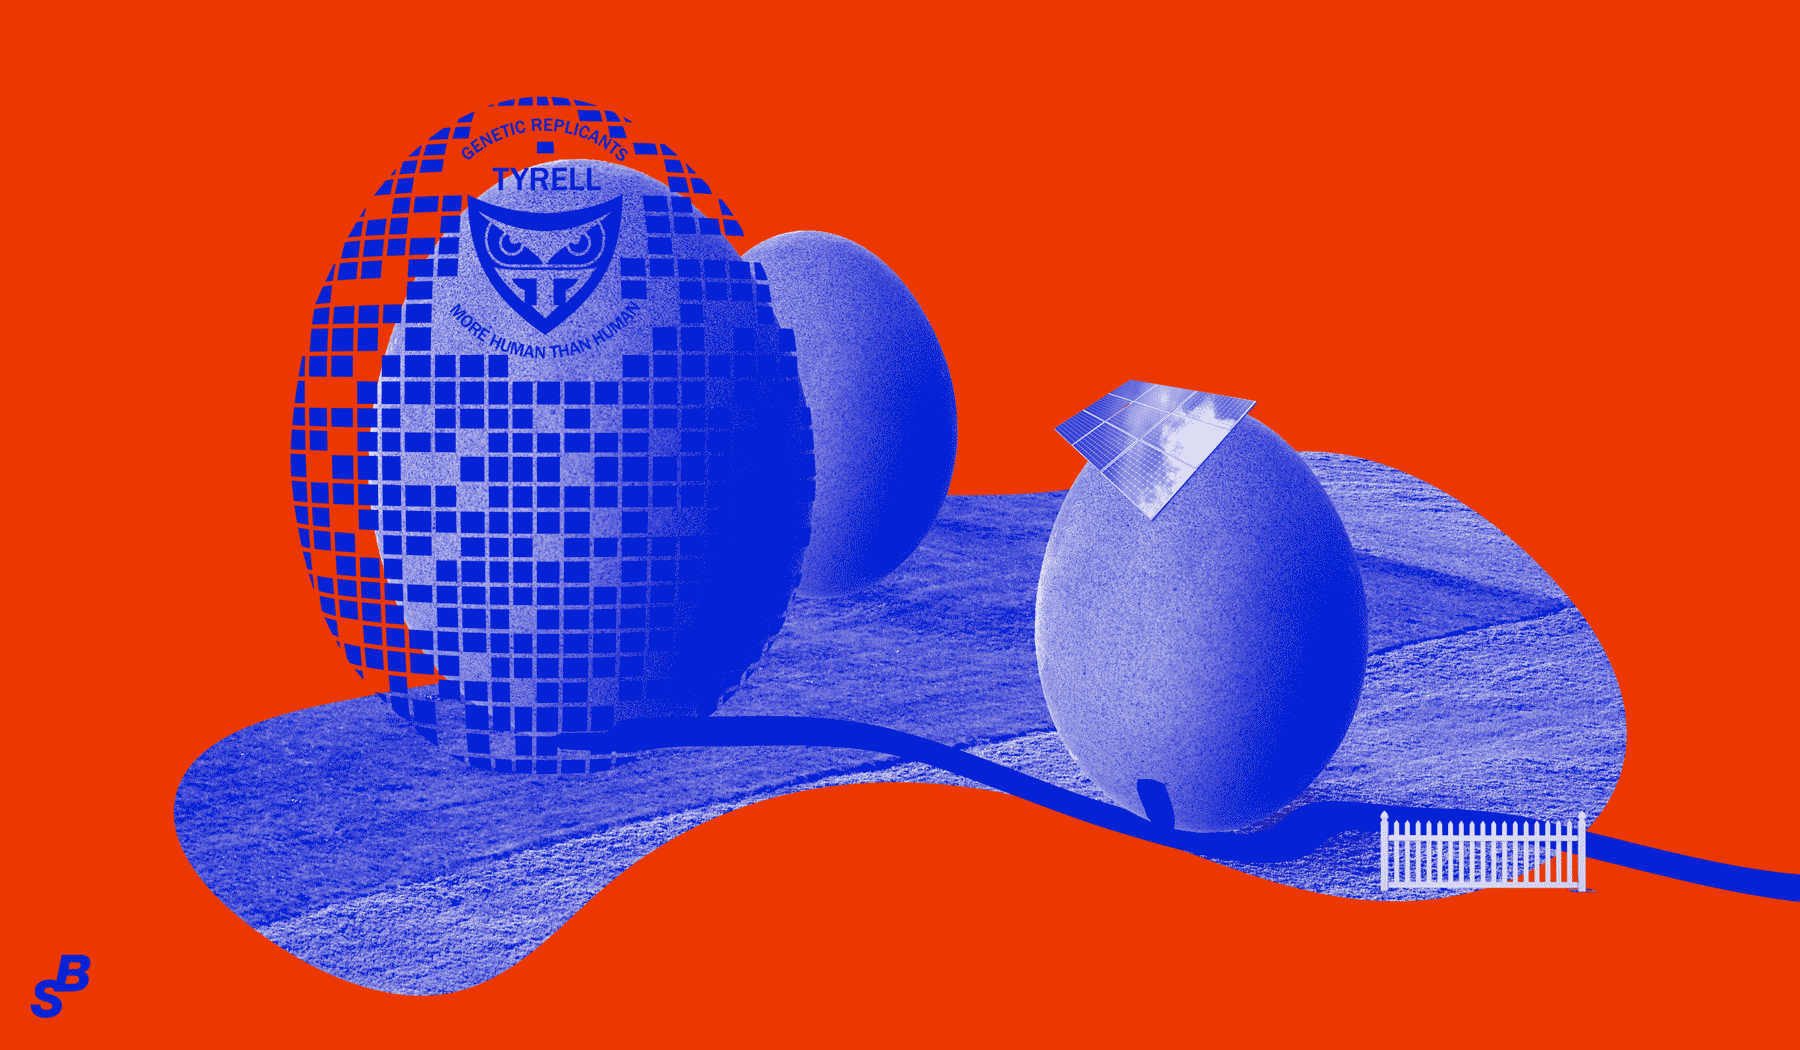 Startling Brands Future Trends, Biomimetic Architecture, Illustration by Mario Dzurila